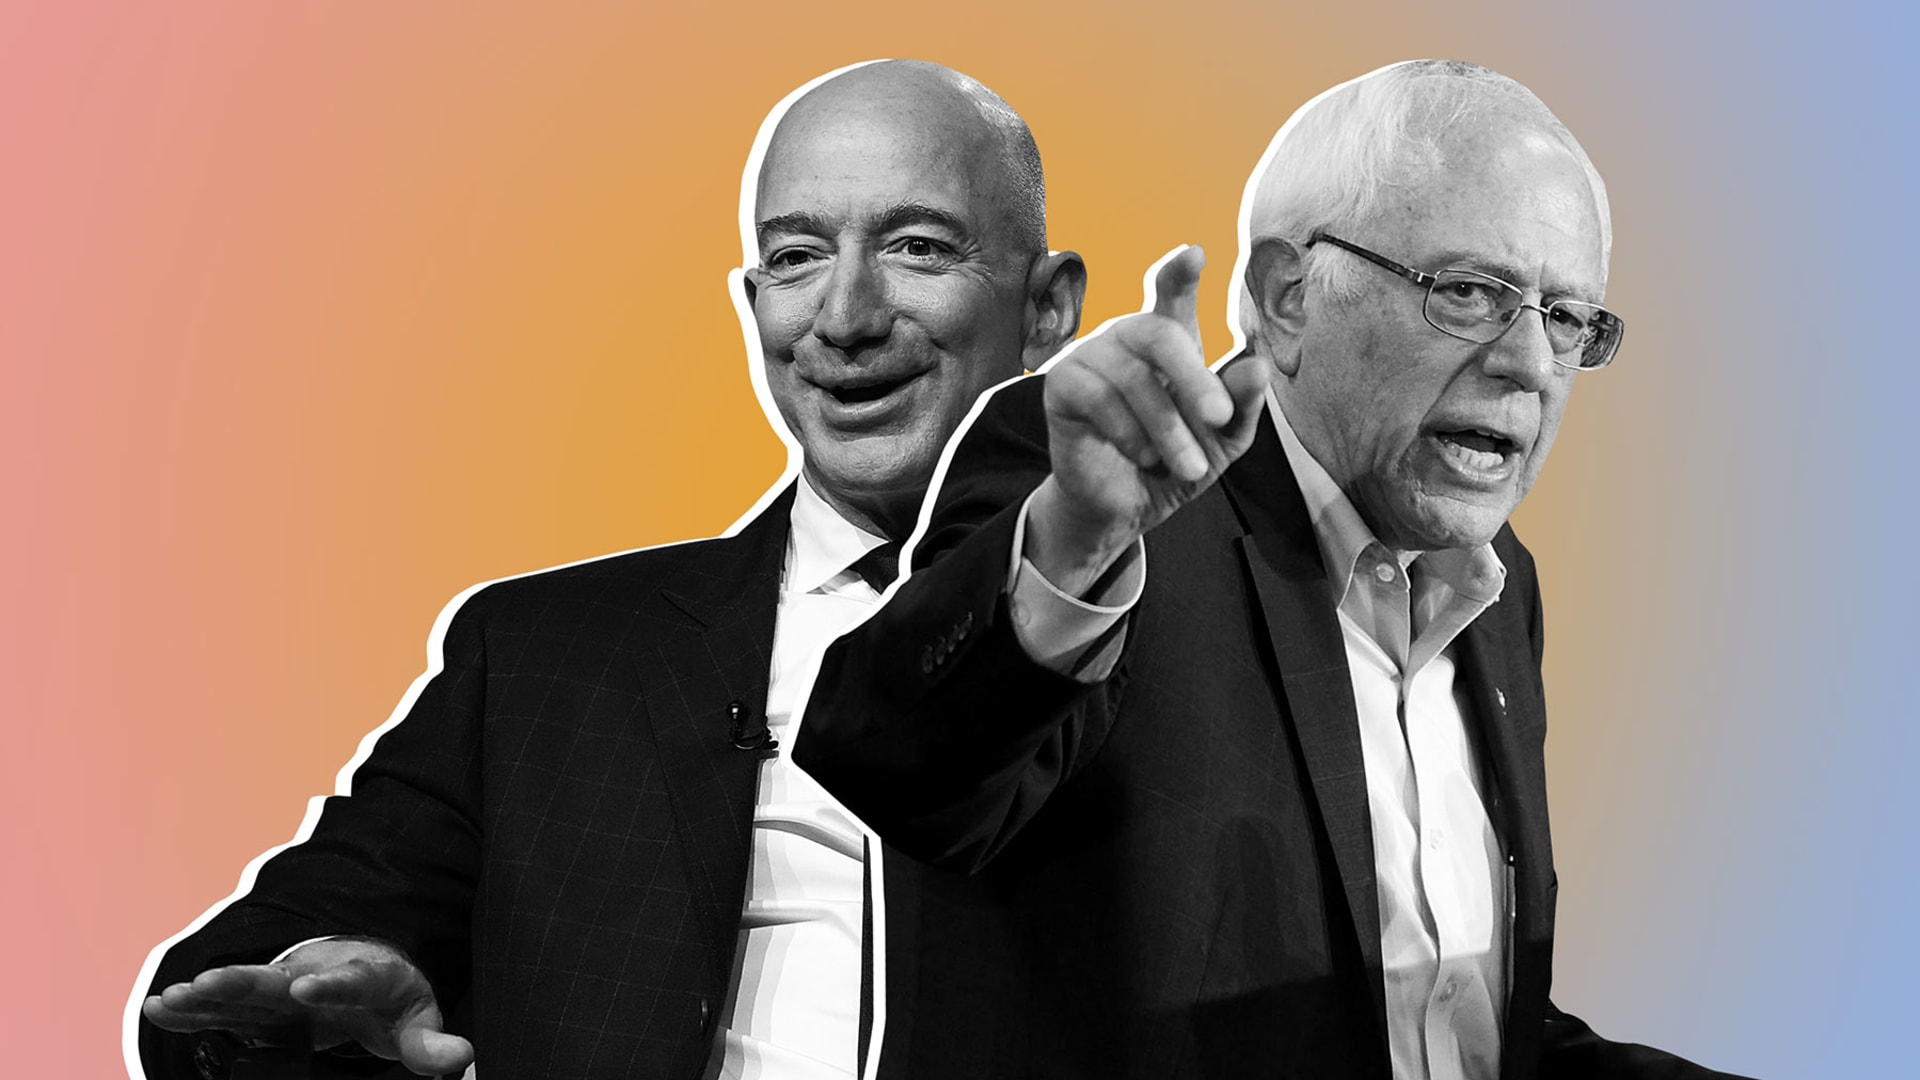 Jeff Bezos and Bernie Sanders.